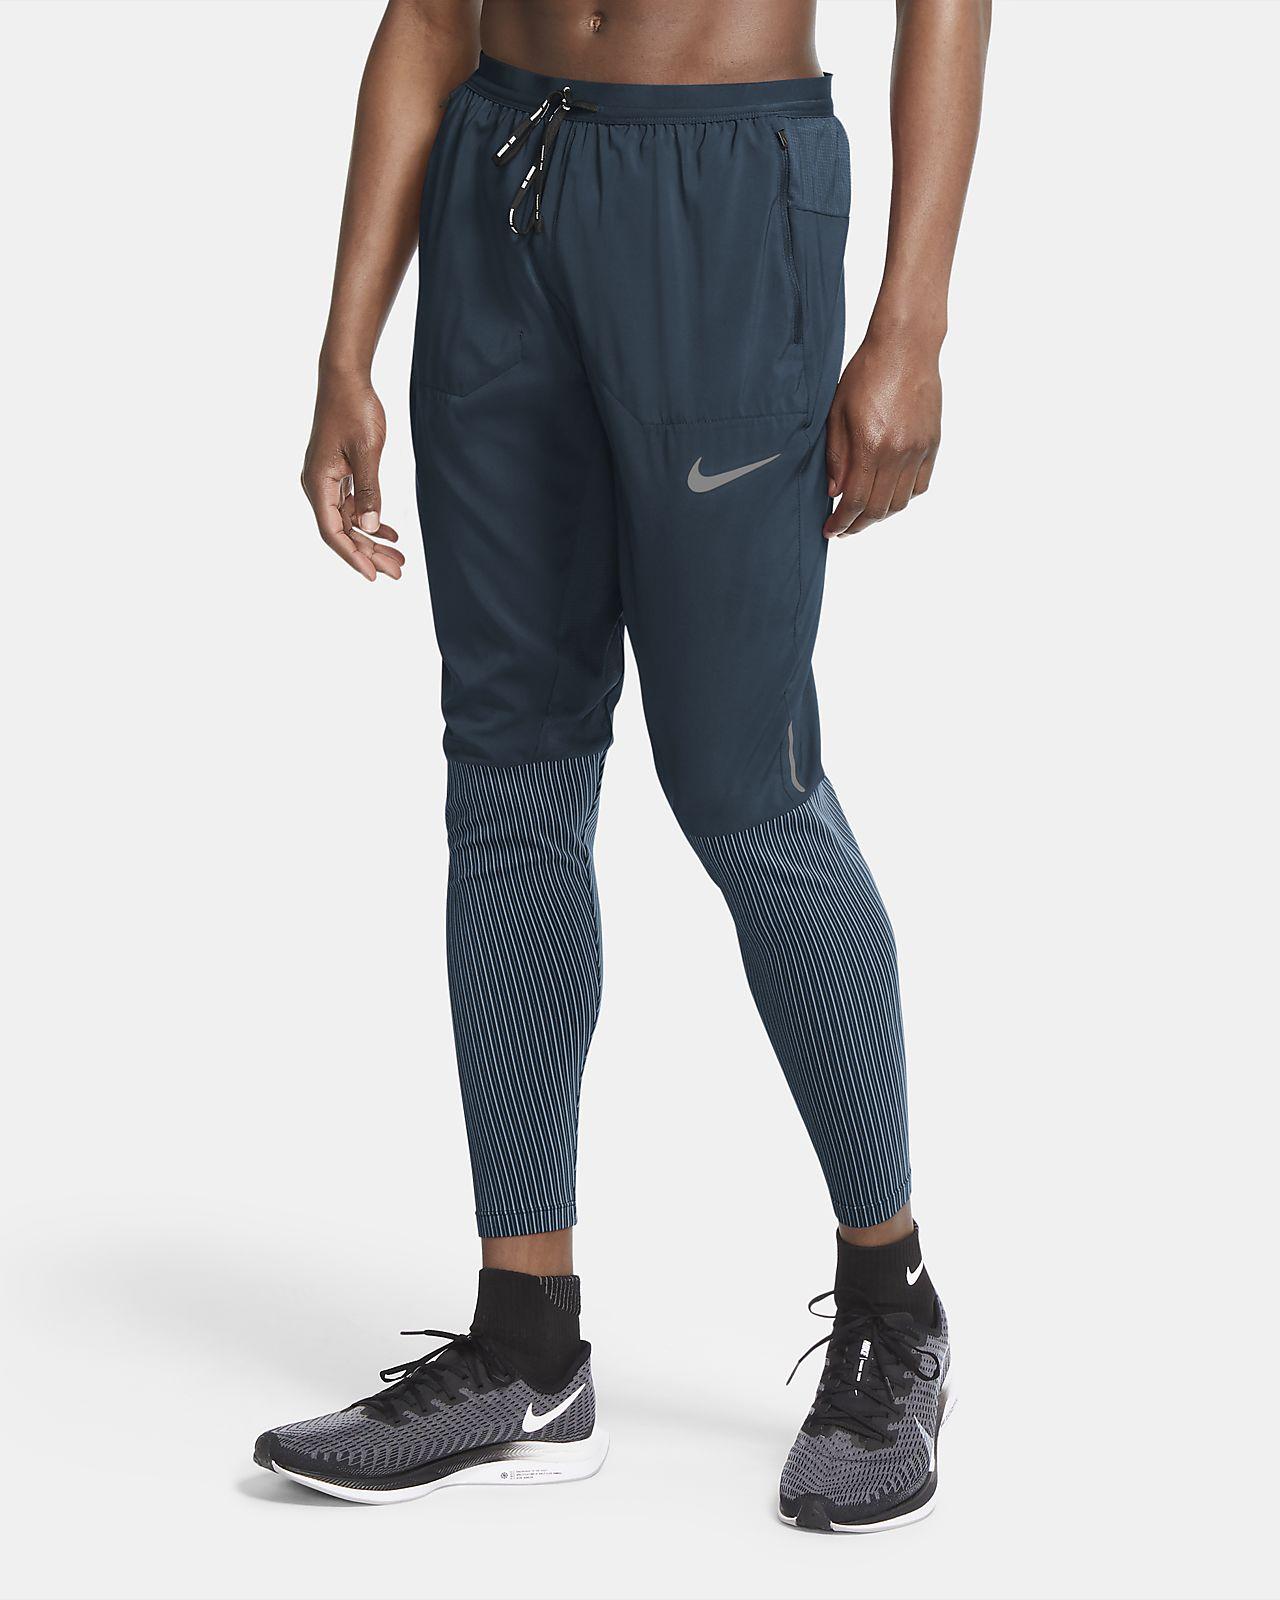 Pantalon de running hybride Nike Phenom Elite Future Fast pour Homme